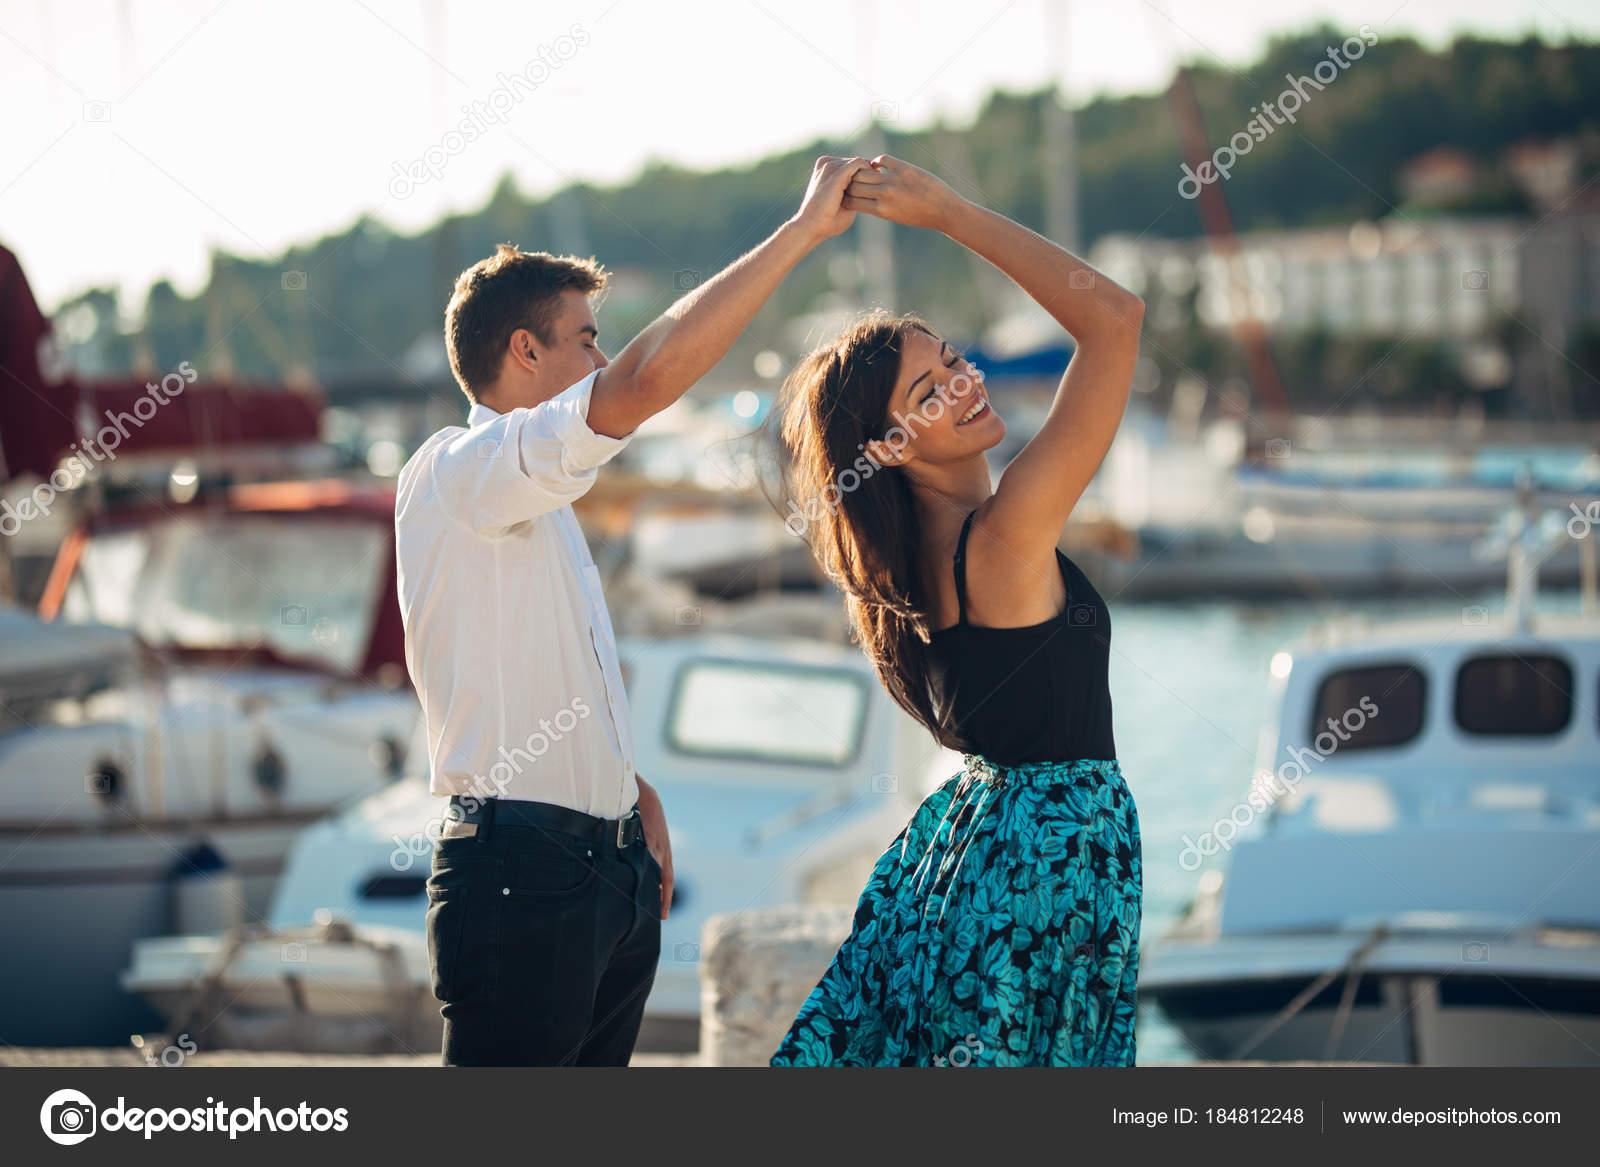 speed dating em lisboa